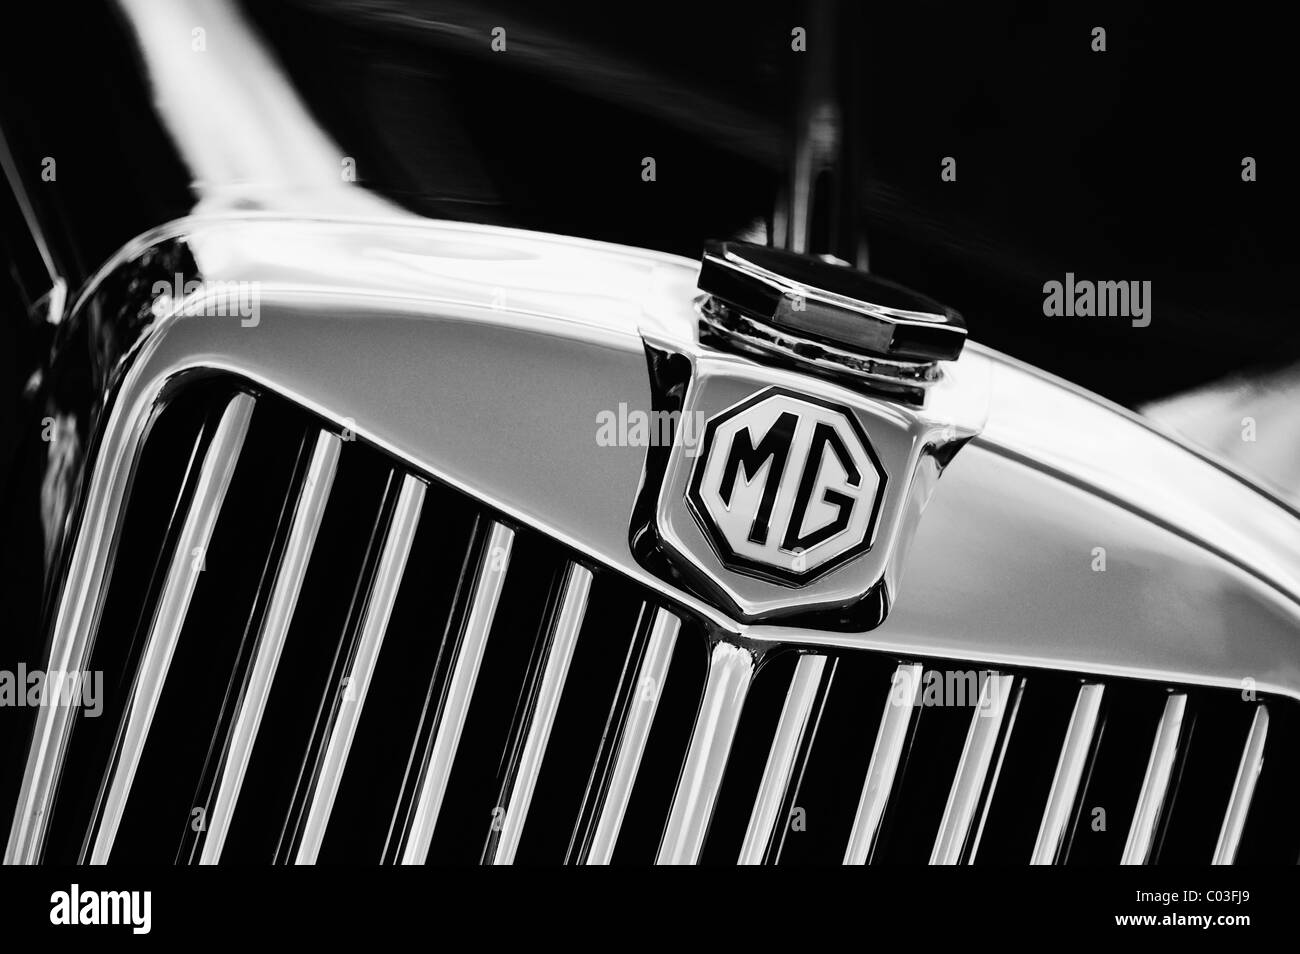 MG TF 1500 classic british car. Monochrome - Stock Image